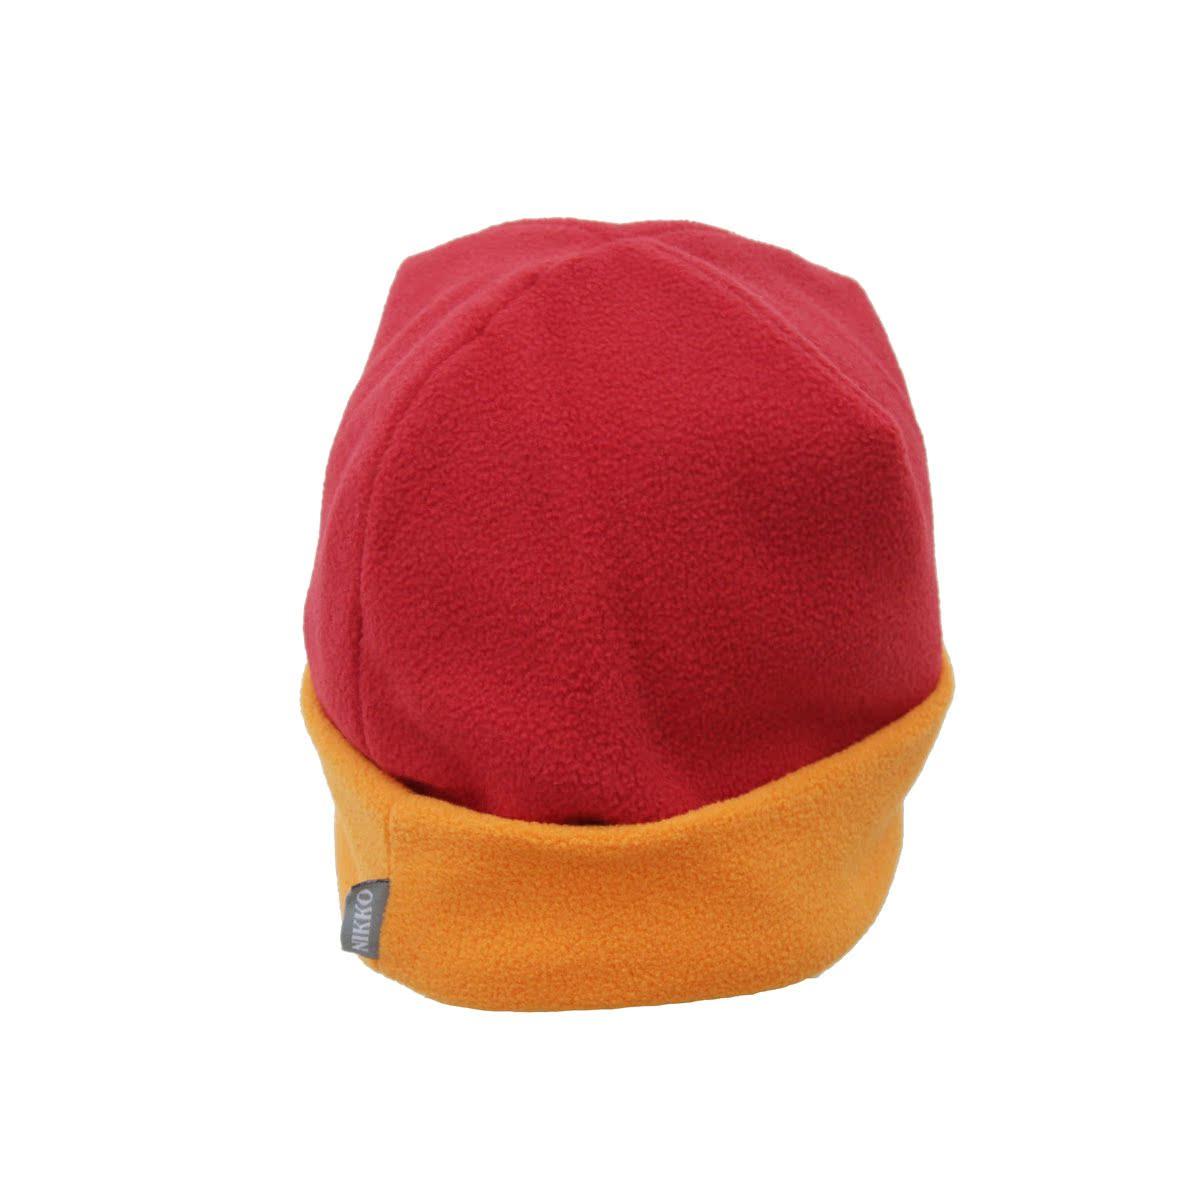 Шапки и кепки для туризма и кемпинга Nikko nwh/049 Nikko / hidaka